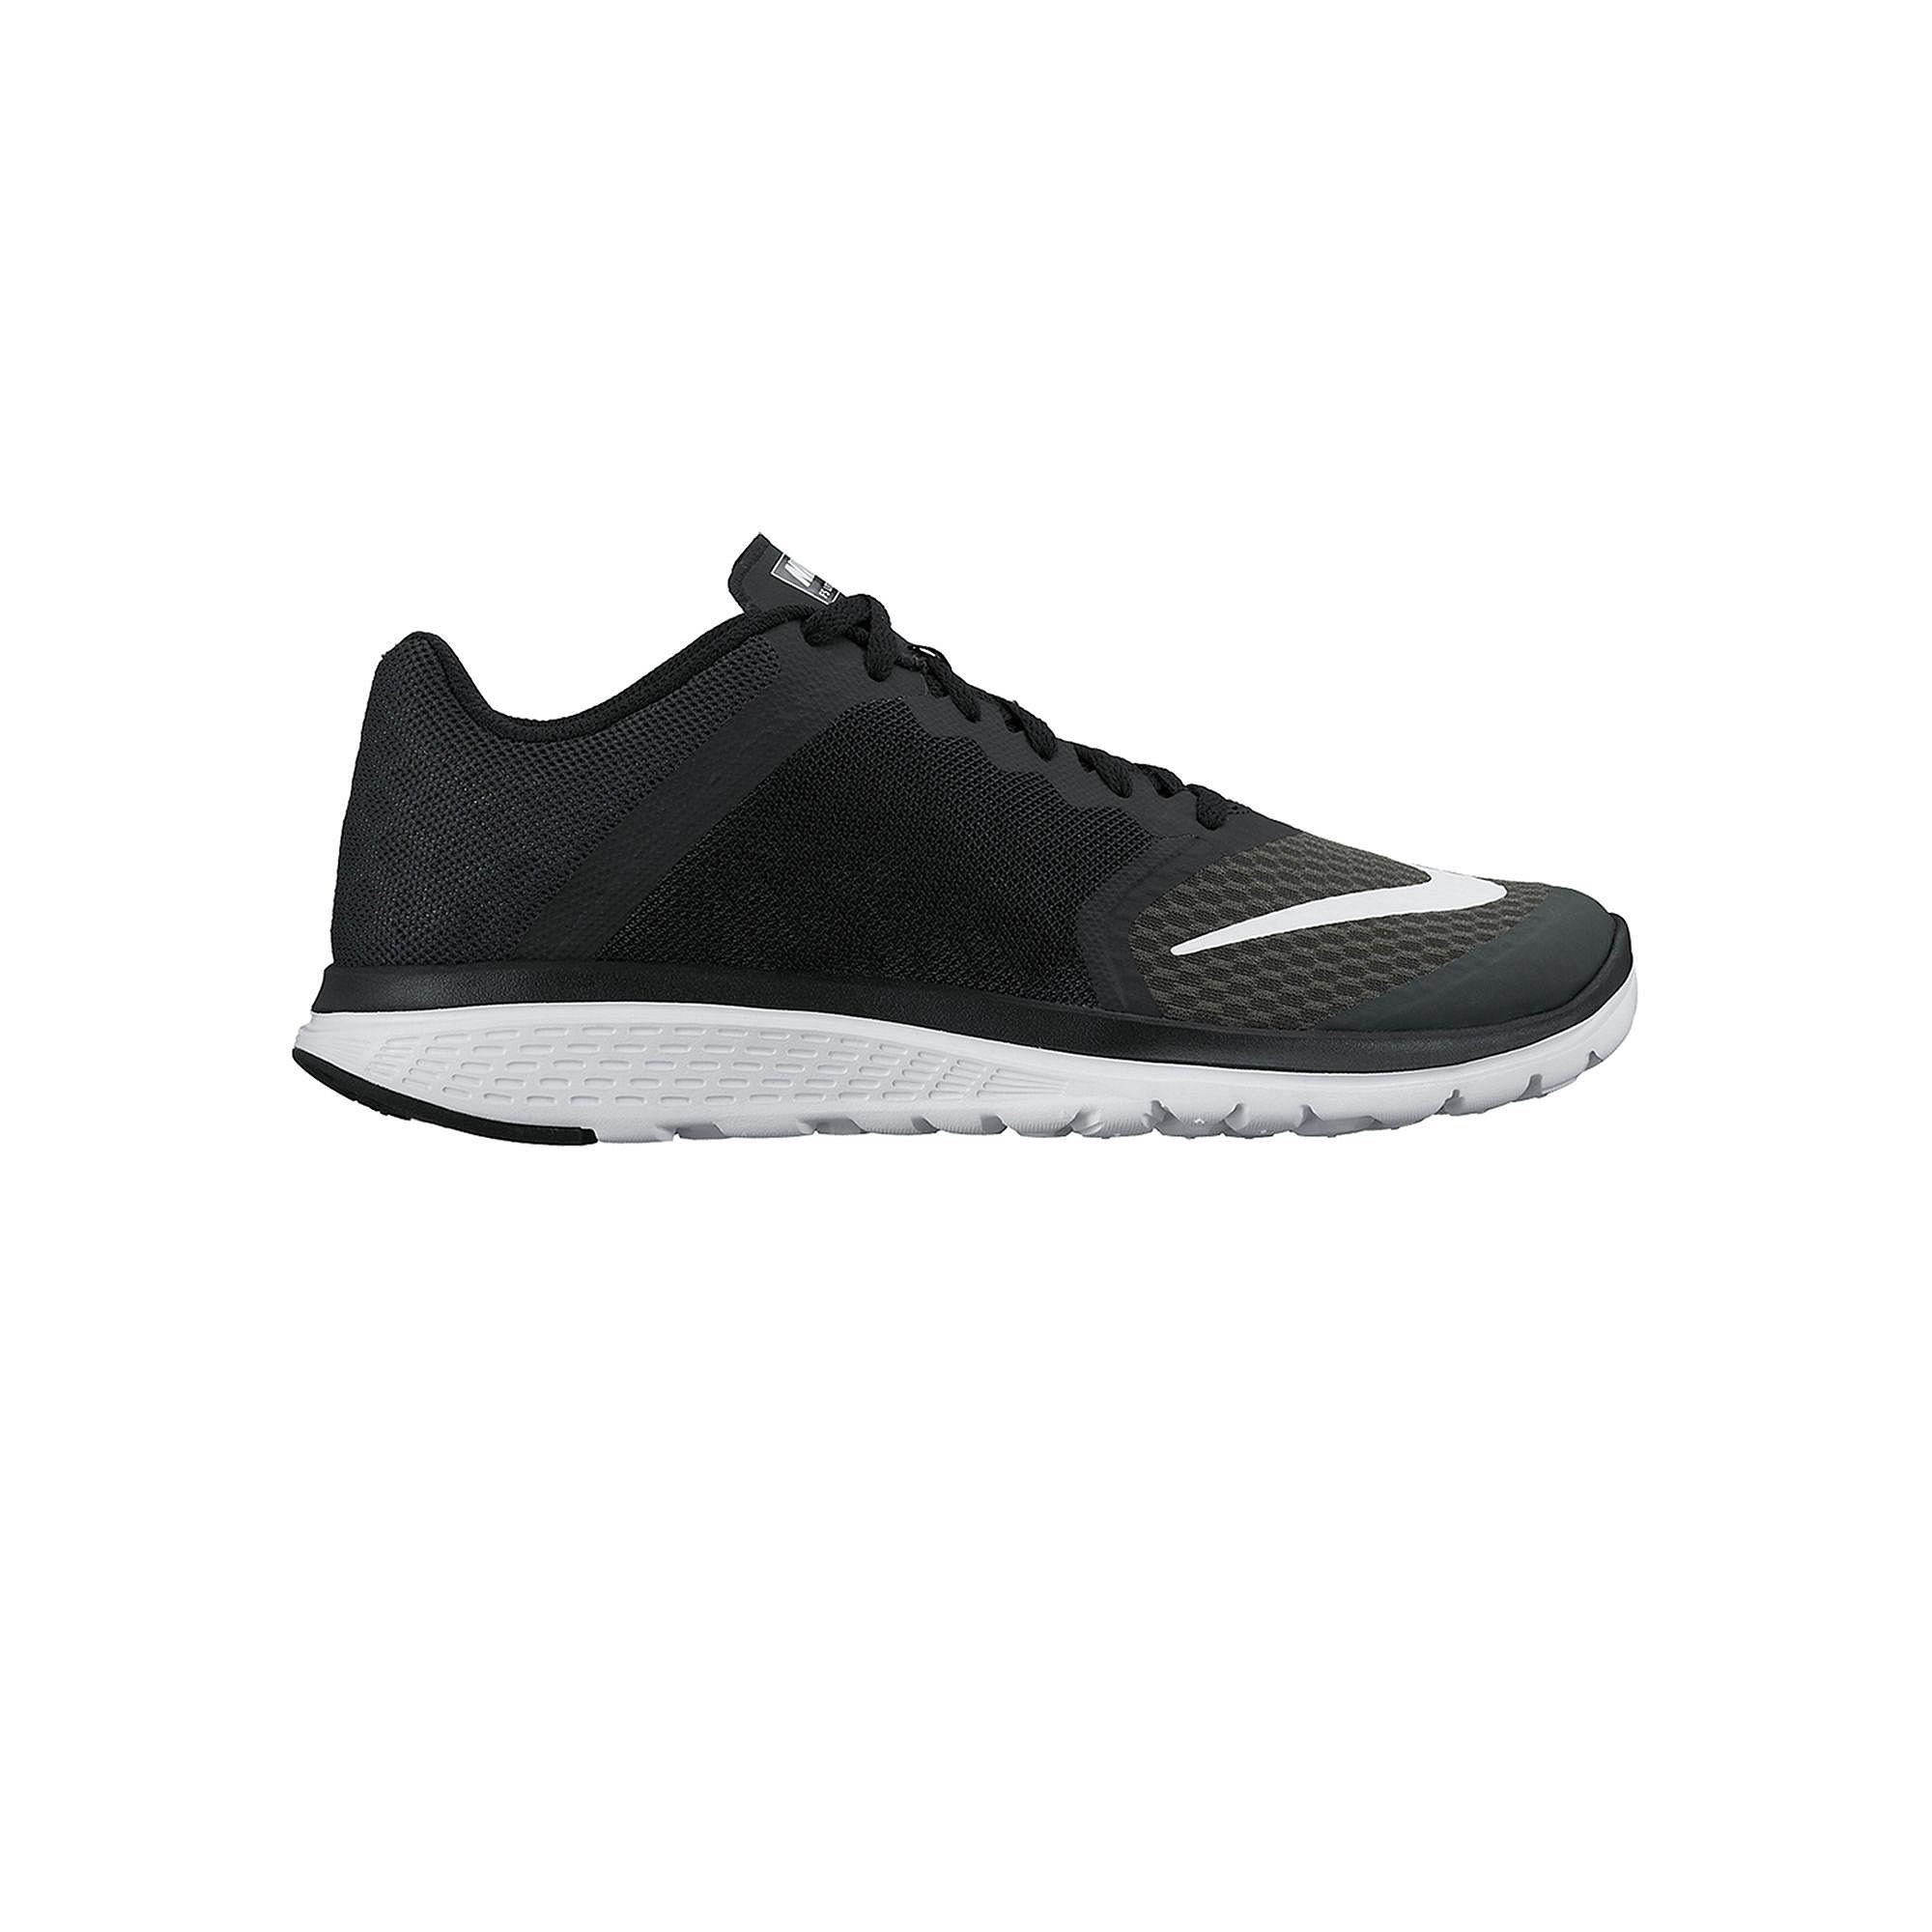 Nike Shoes Black Lite Weigth